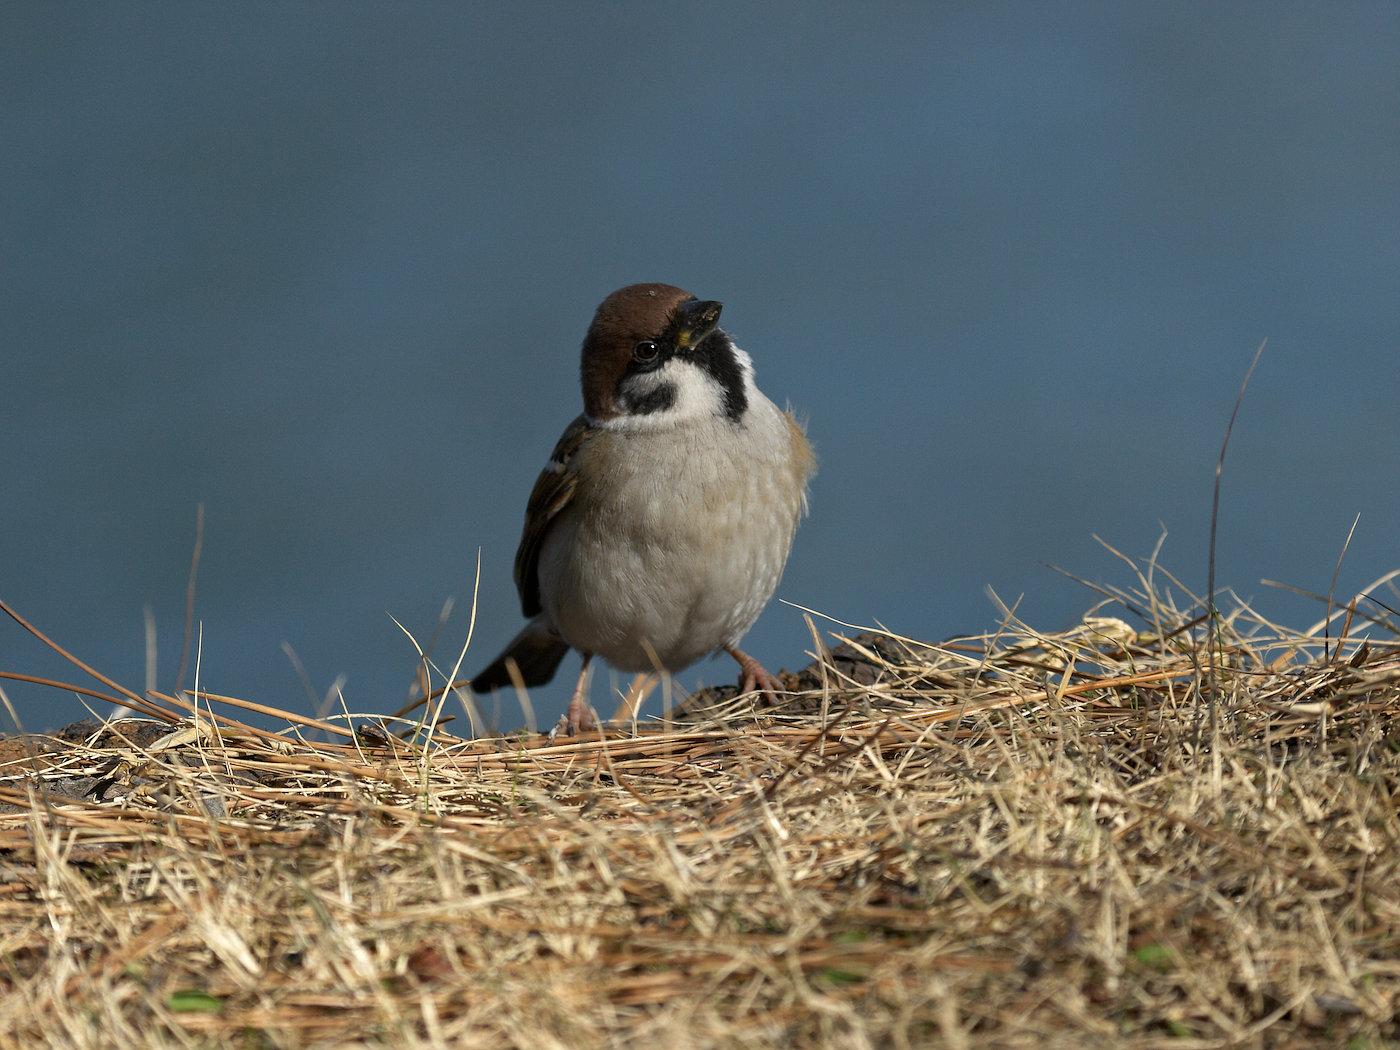 BORG50FLで撮影した野鳥・スズメの写真画像